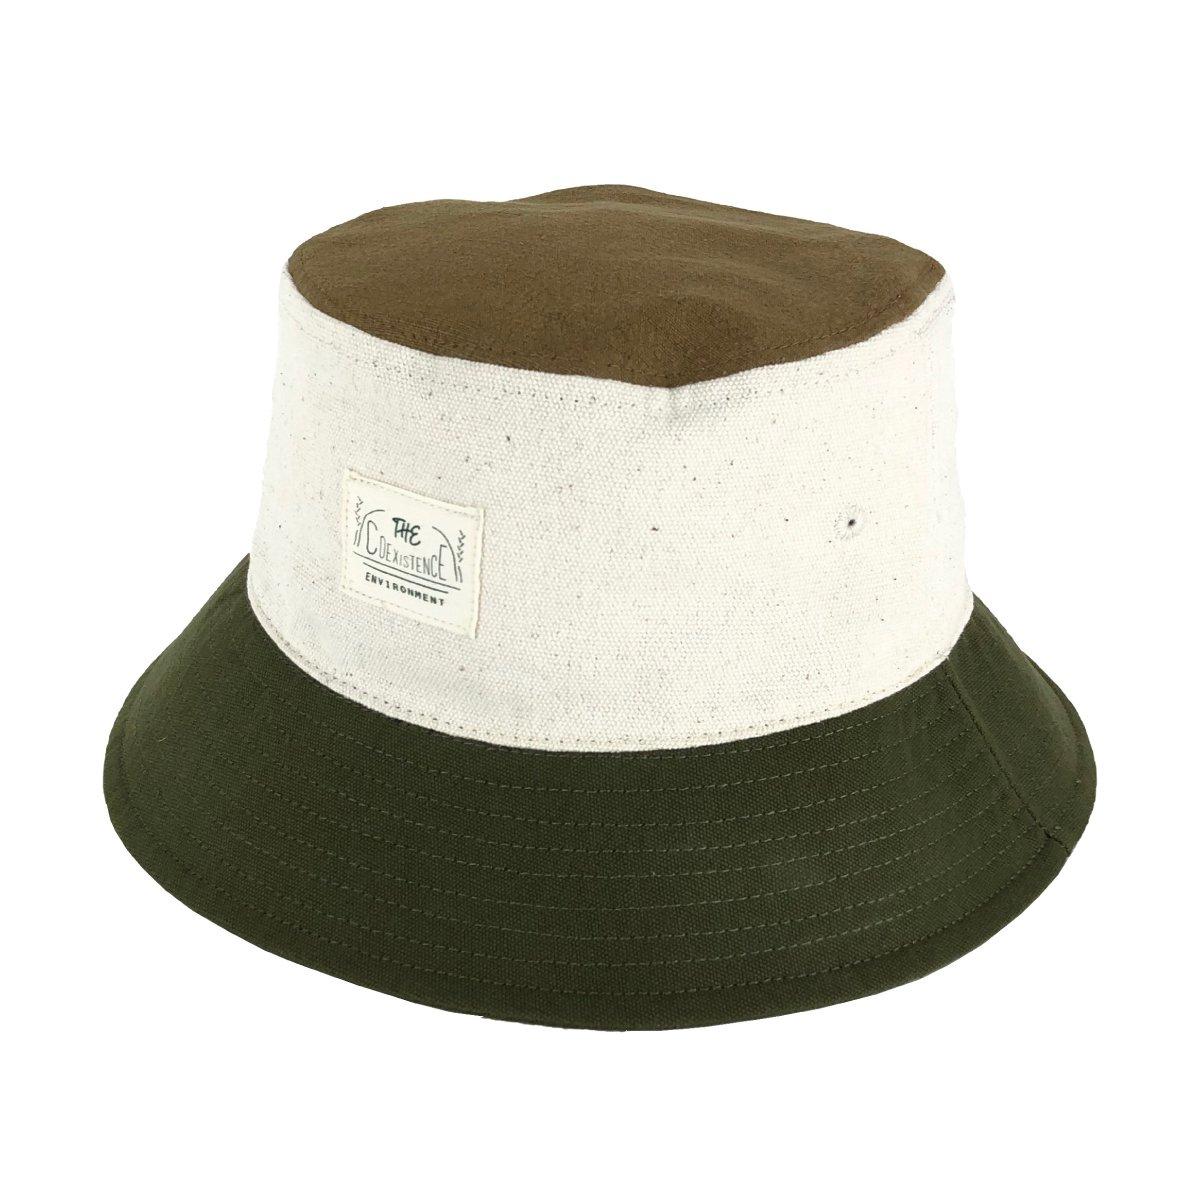 Repro Hat 詳細画像3